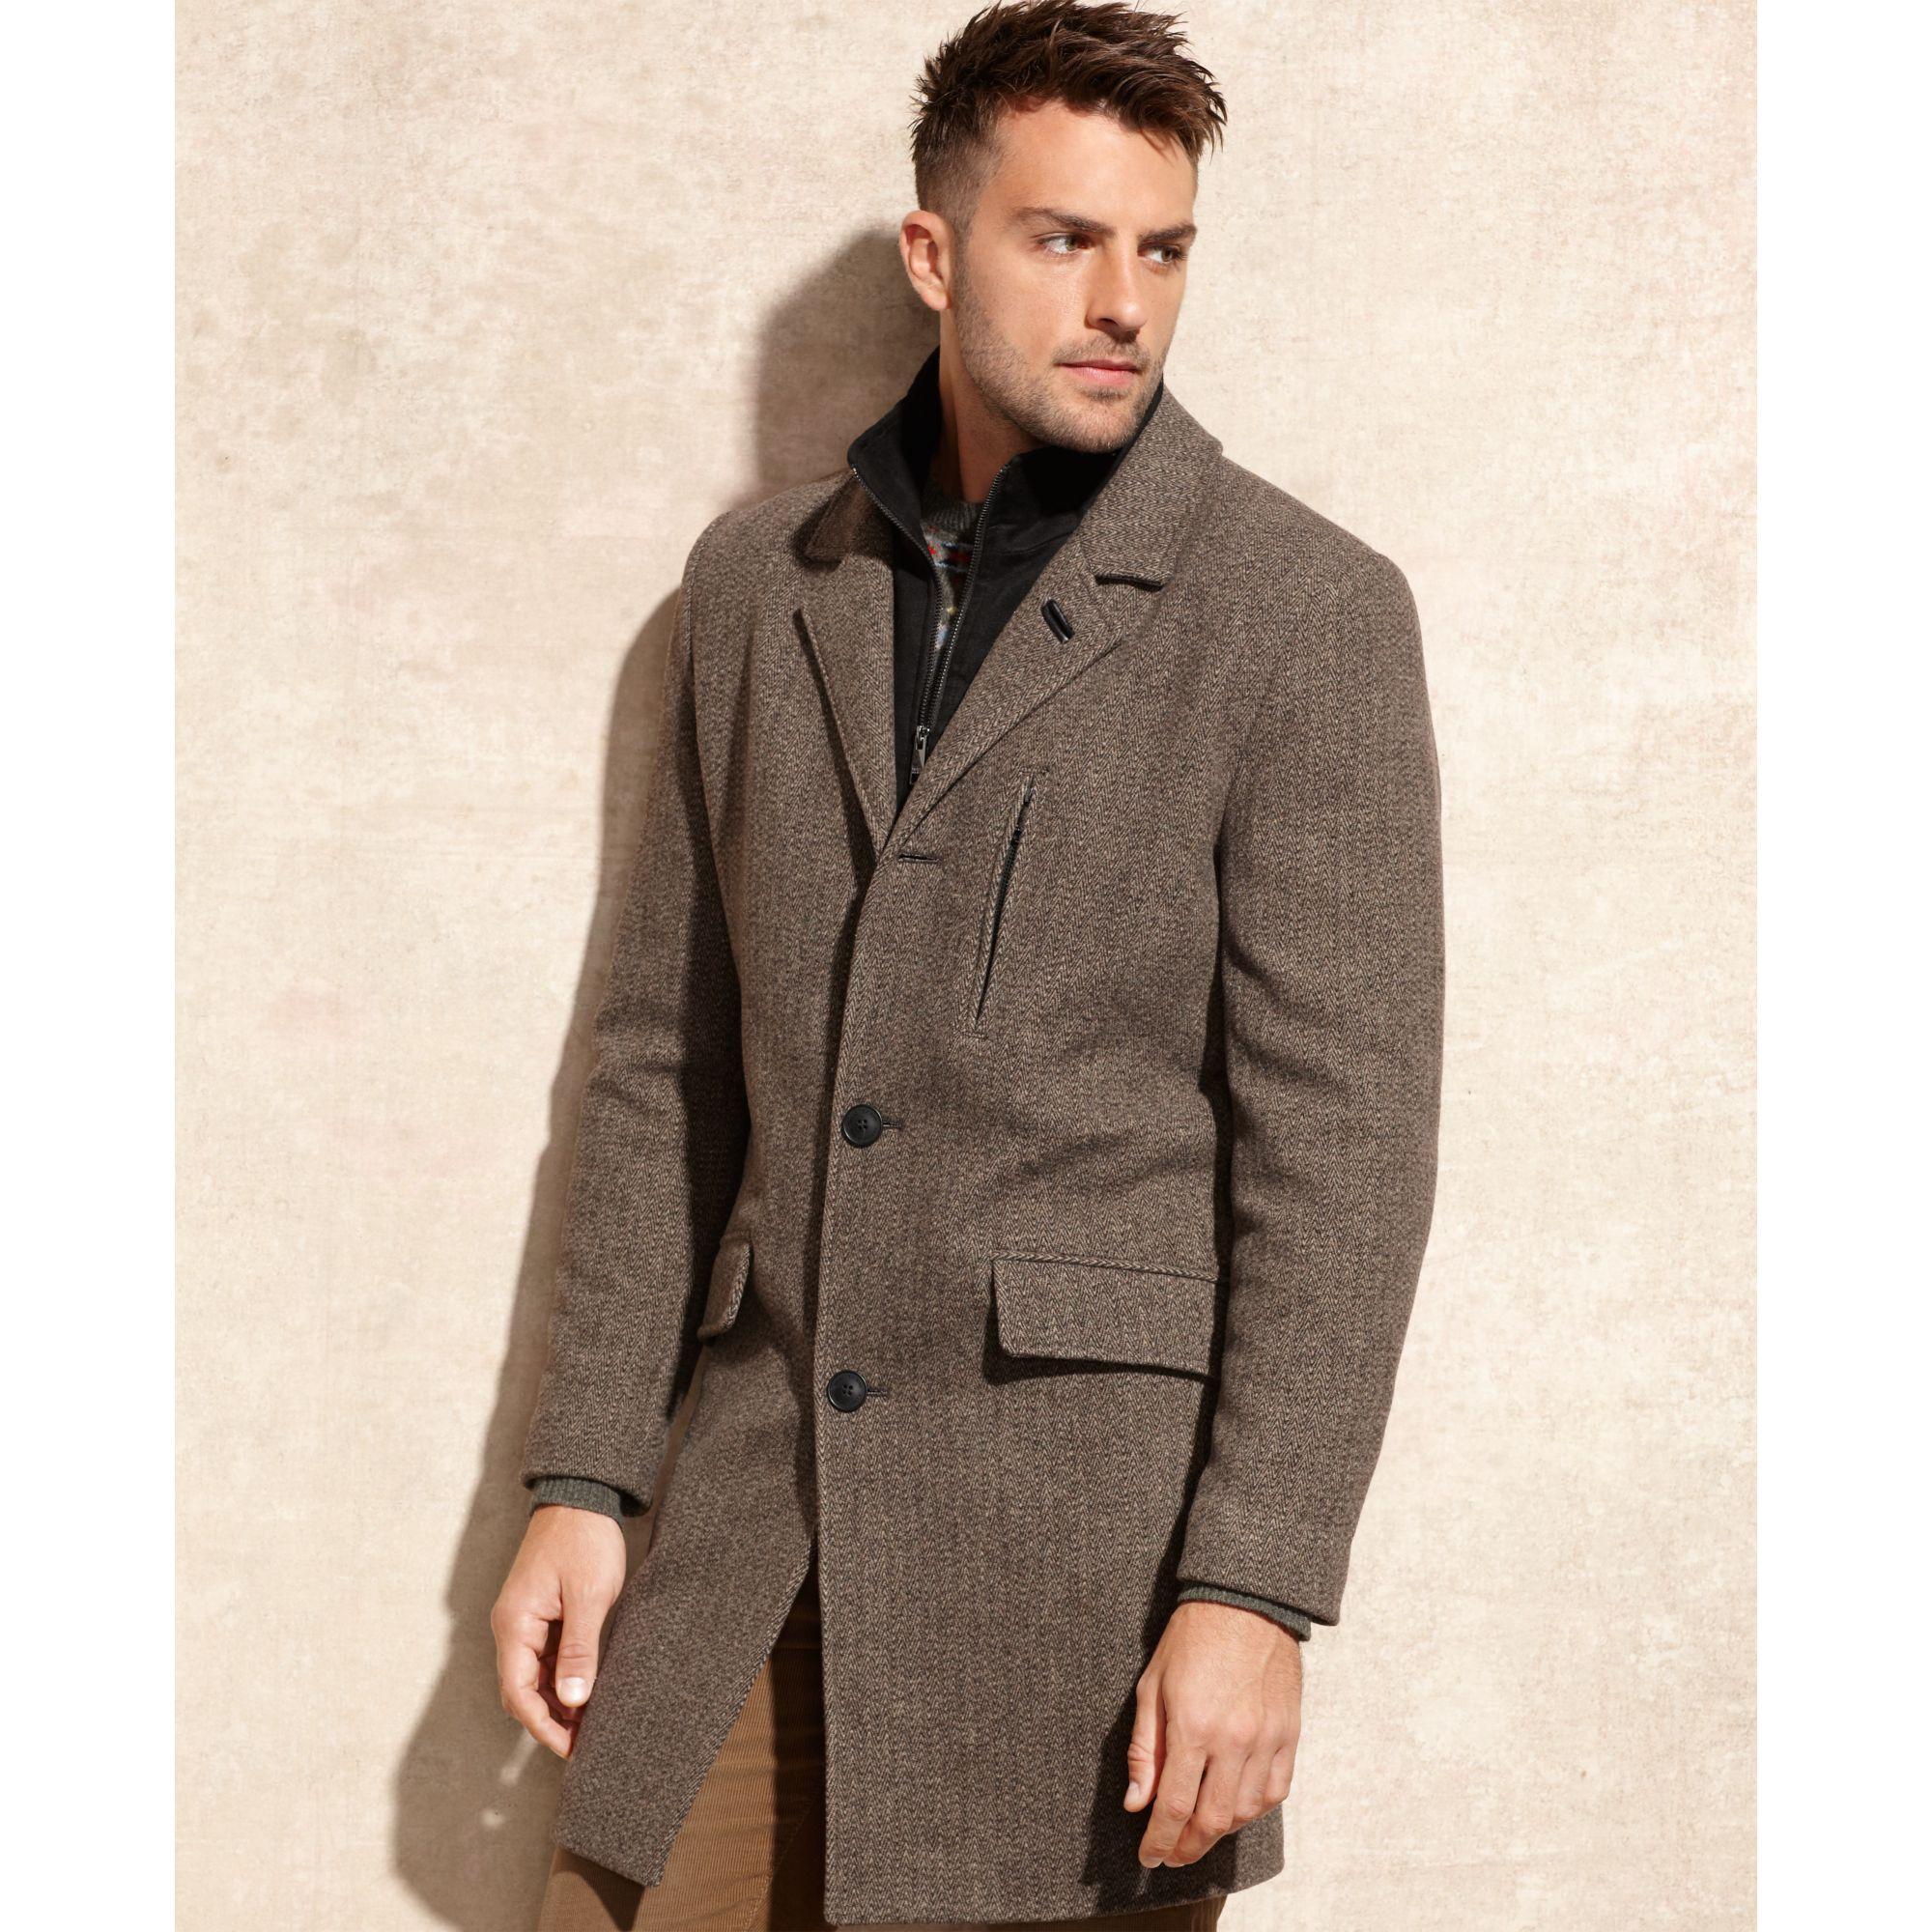 Marc new york Hoyt Herringbone Wool Top Coat in Natural for Men | Lyst